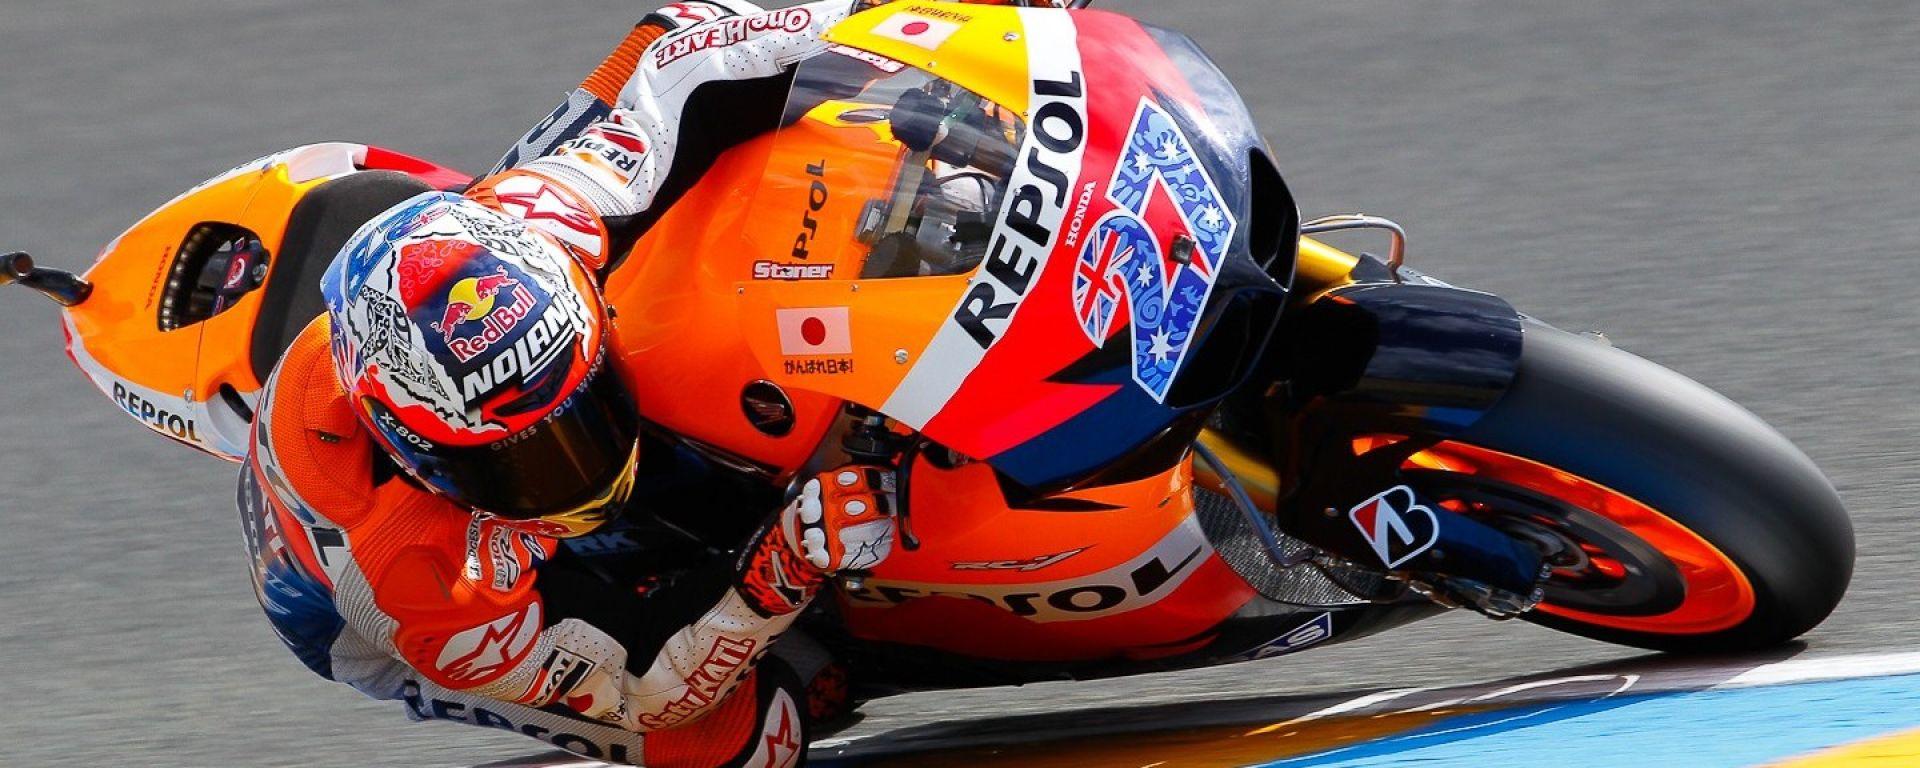 Casey Stoner e la MotoGP